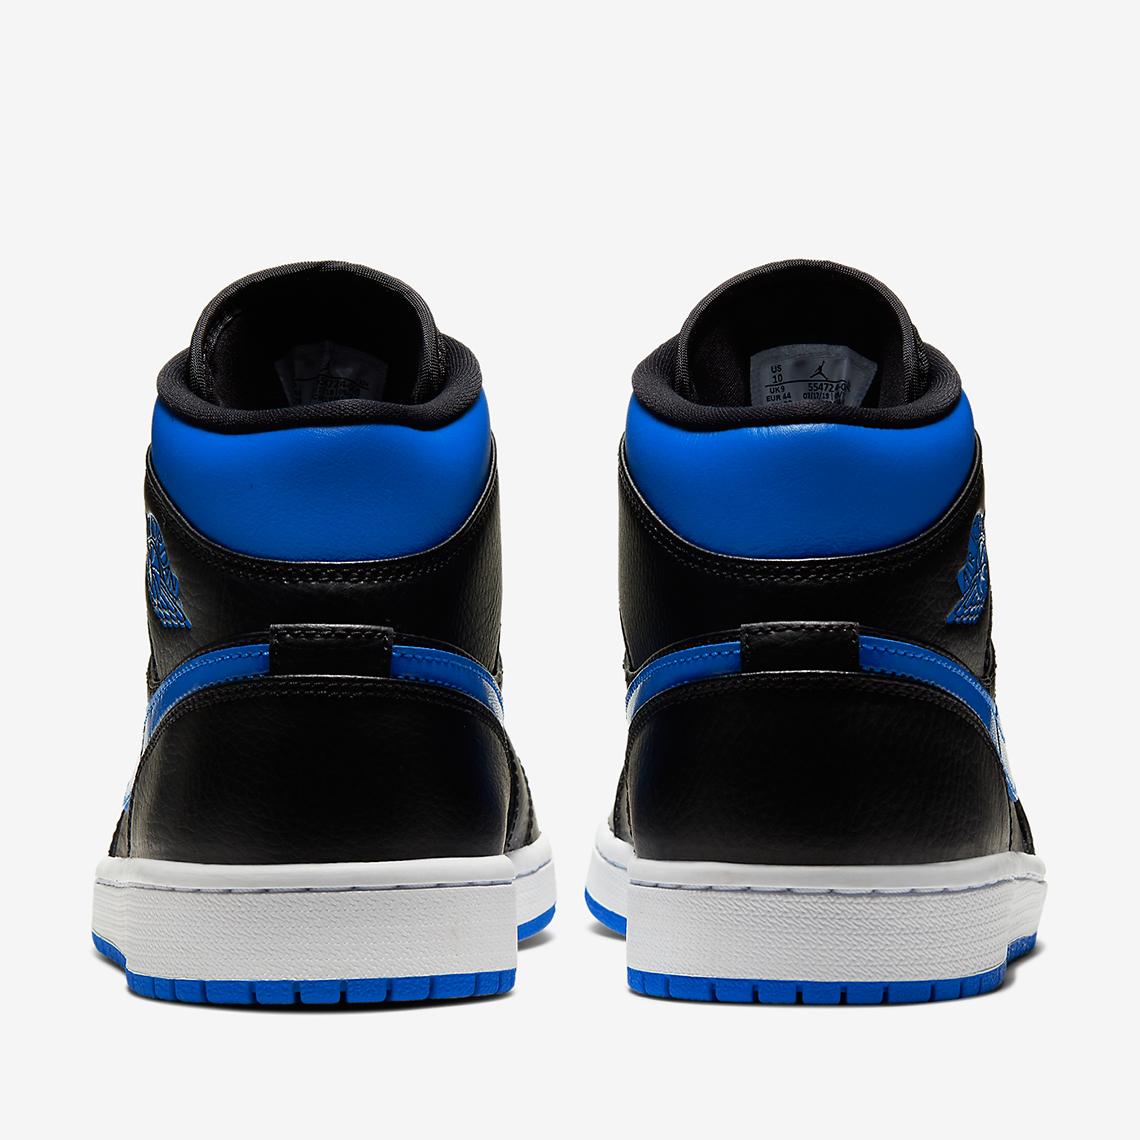 air-jordan-1-mid-royal-554724-068-official-images-4 heel